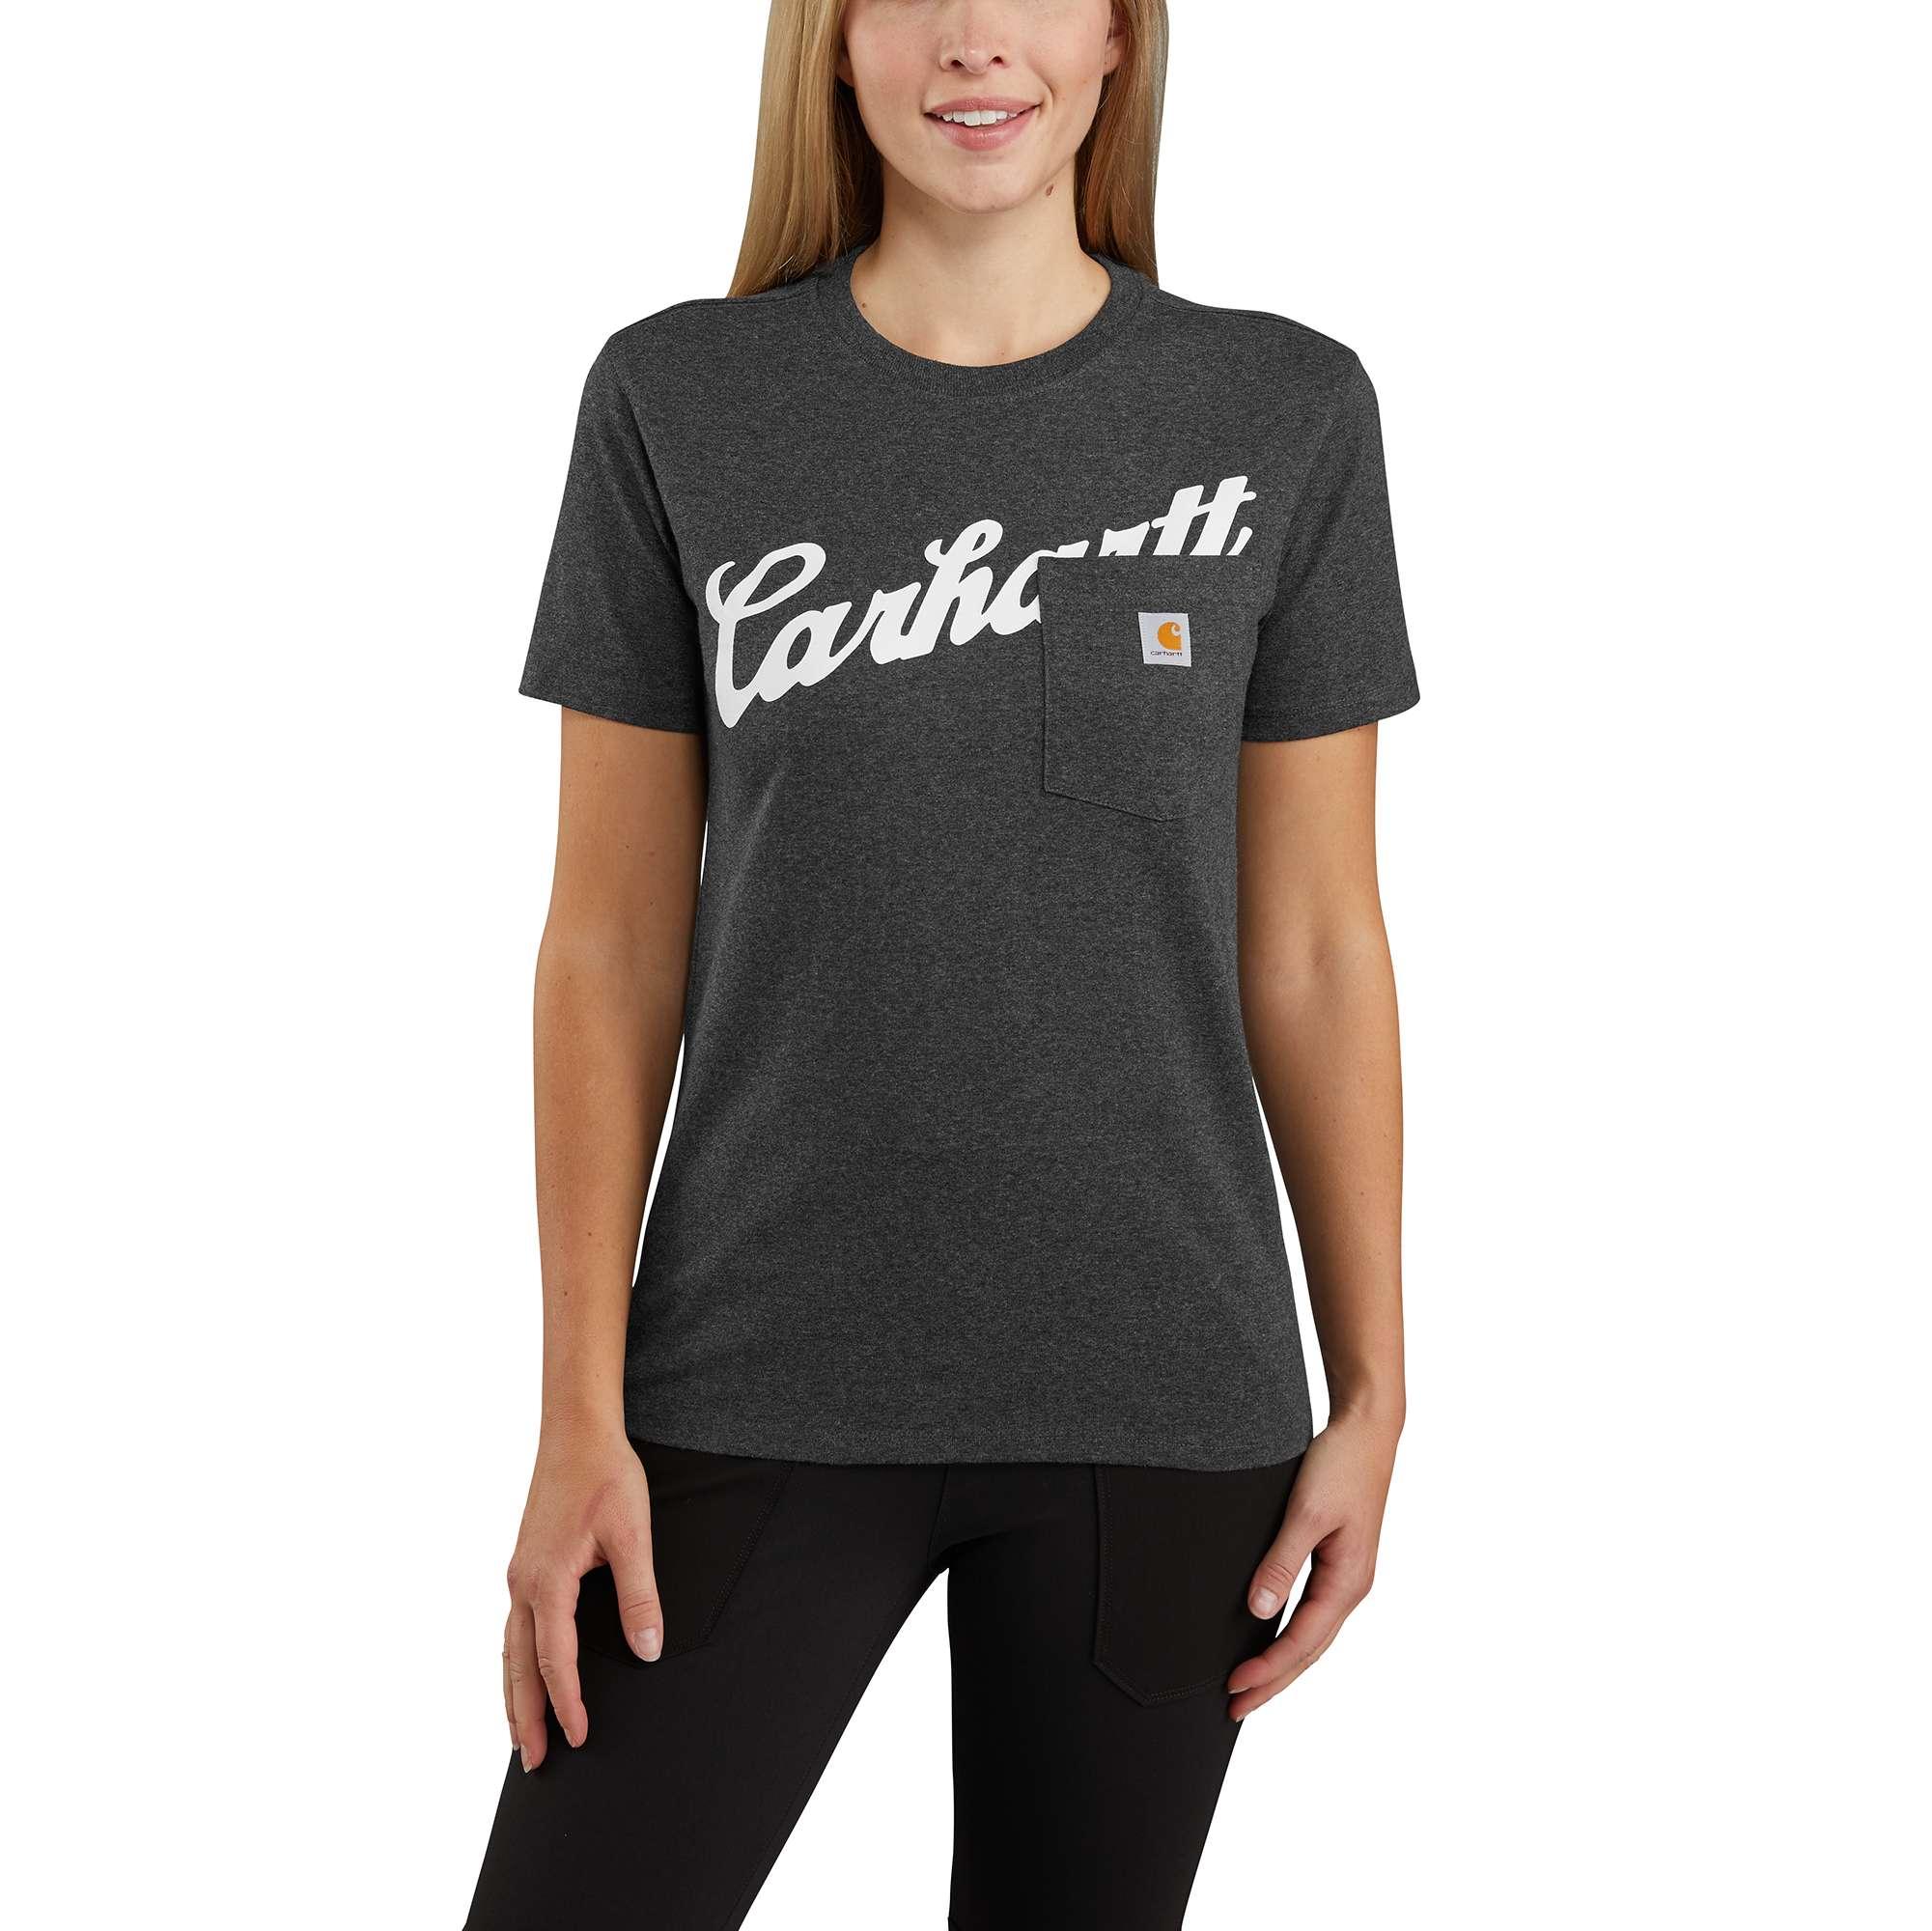 Carhartt Original Fit Short-Sleeve Pocket Graphic Tee